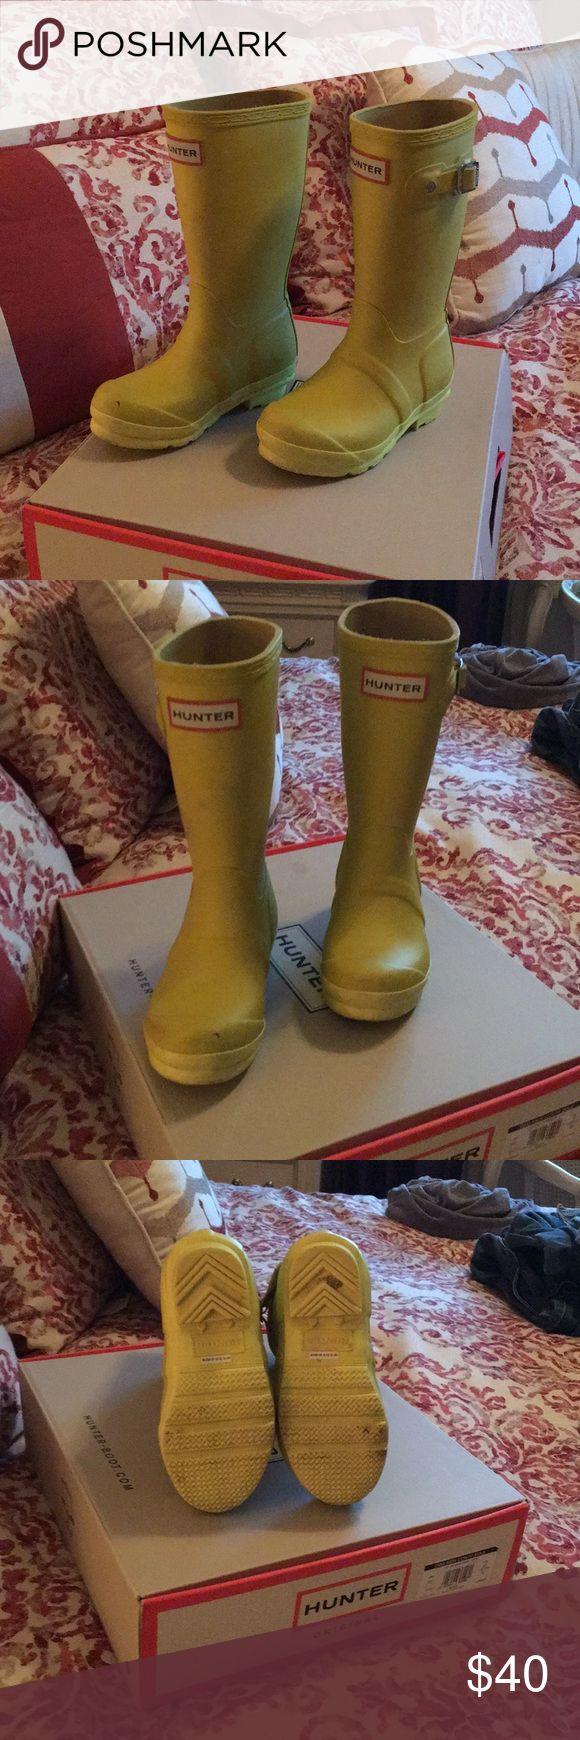 Authentic Kids Hunter Rain Boots size 11 Yellow Gently worn kids Hunter Rain boots Hunter Boots Shoes Rain & Snow Boots